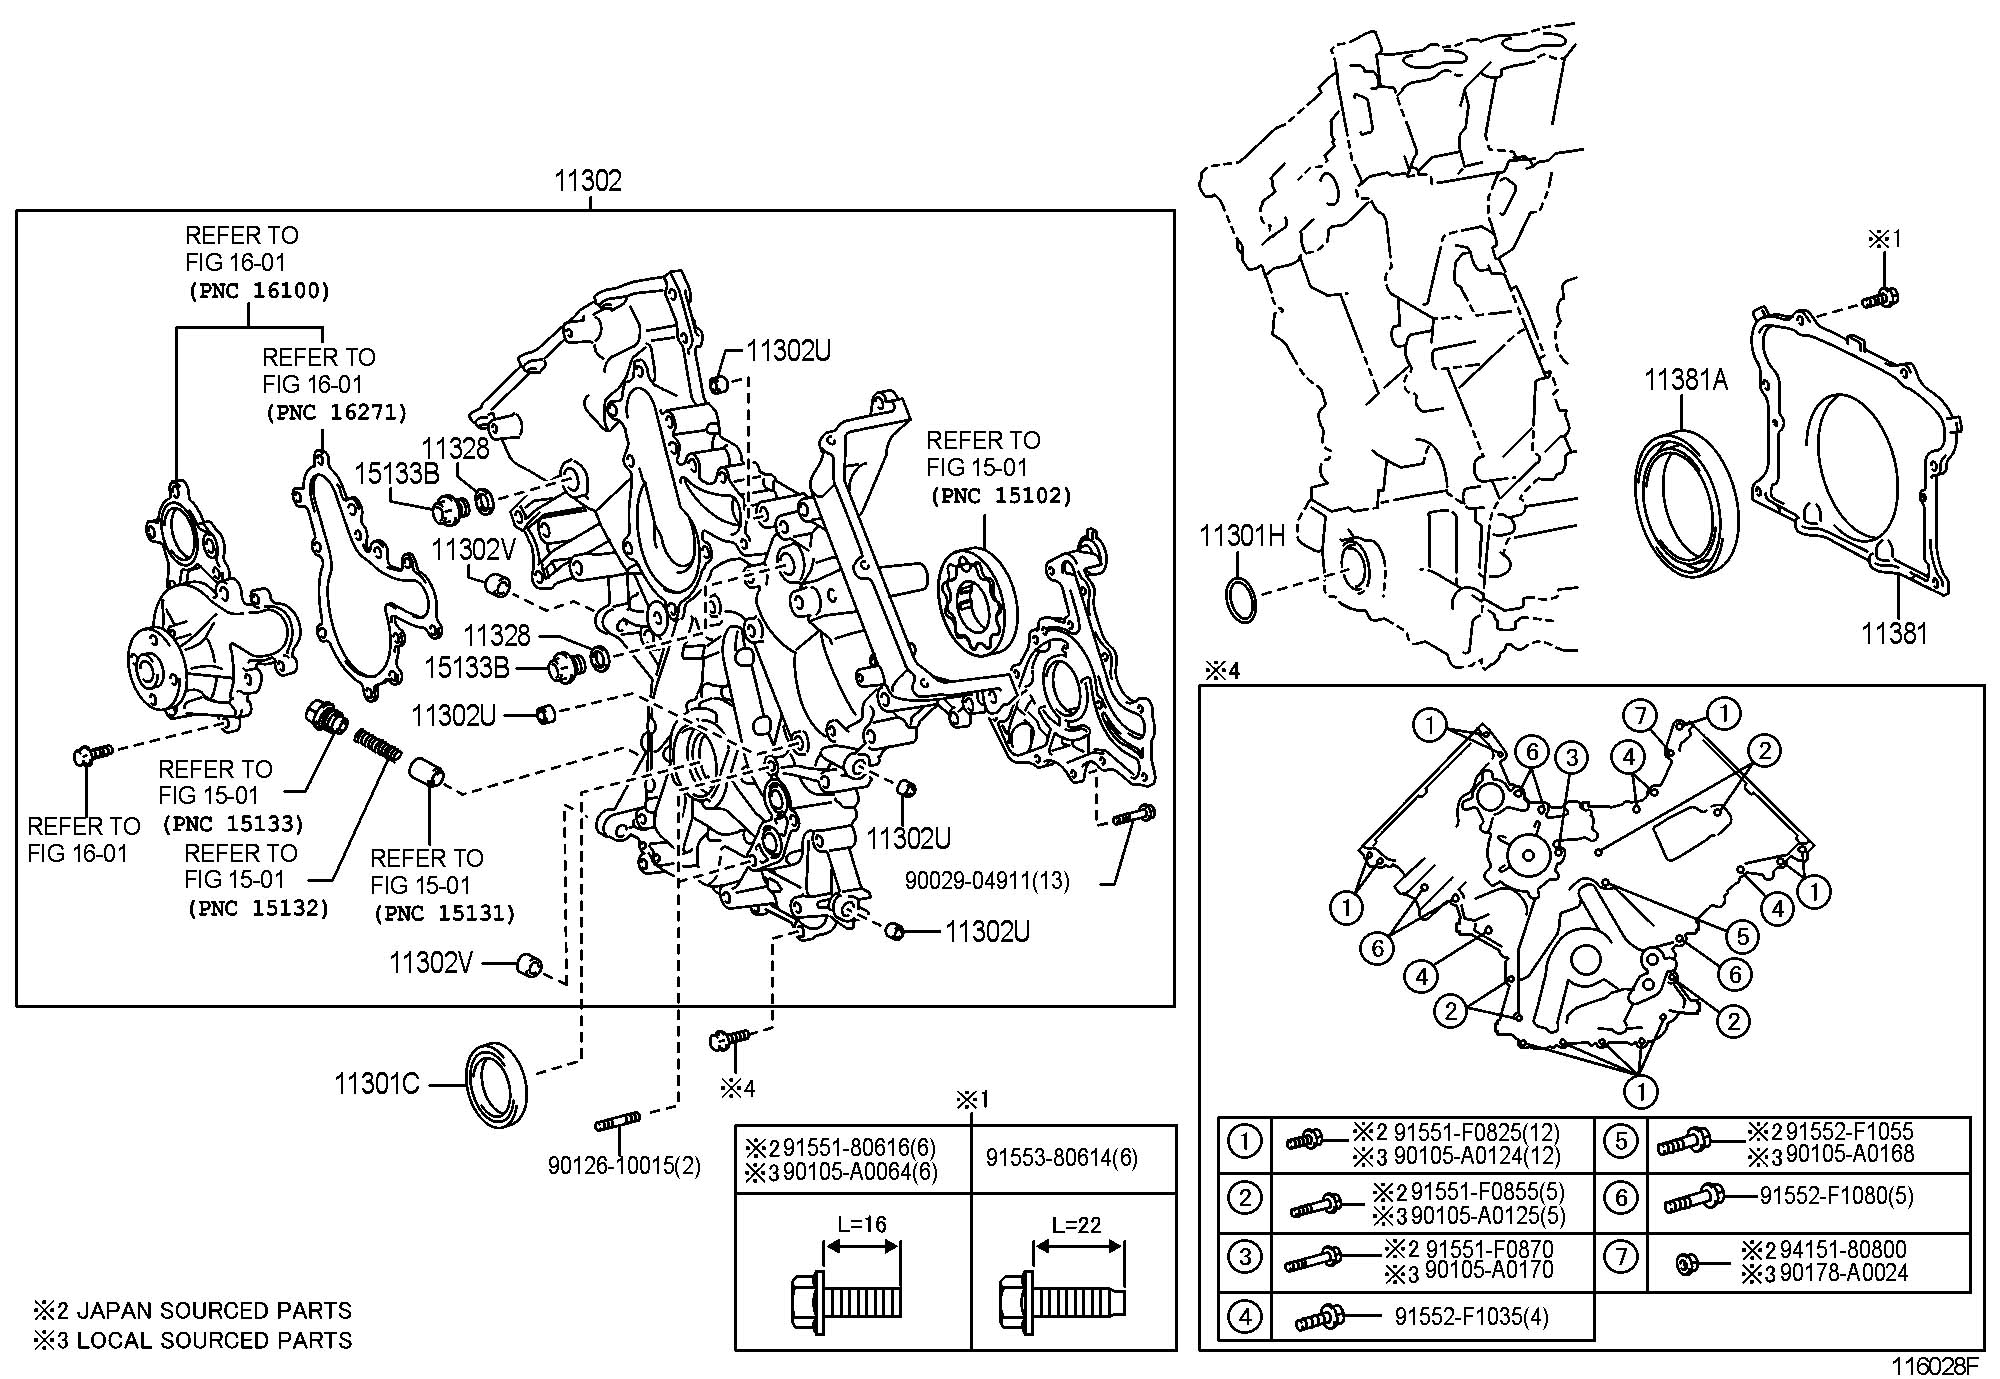 2004 toyota sienna wiring diagram 2014 schematics ford taurus schematic 22re igniter tundra backup camera auto